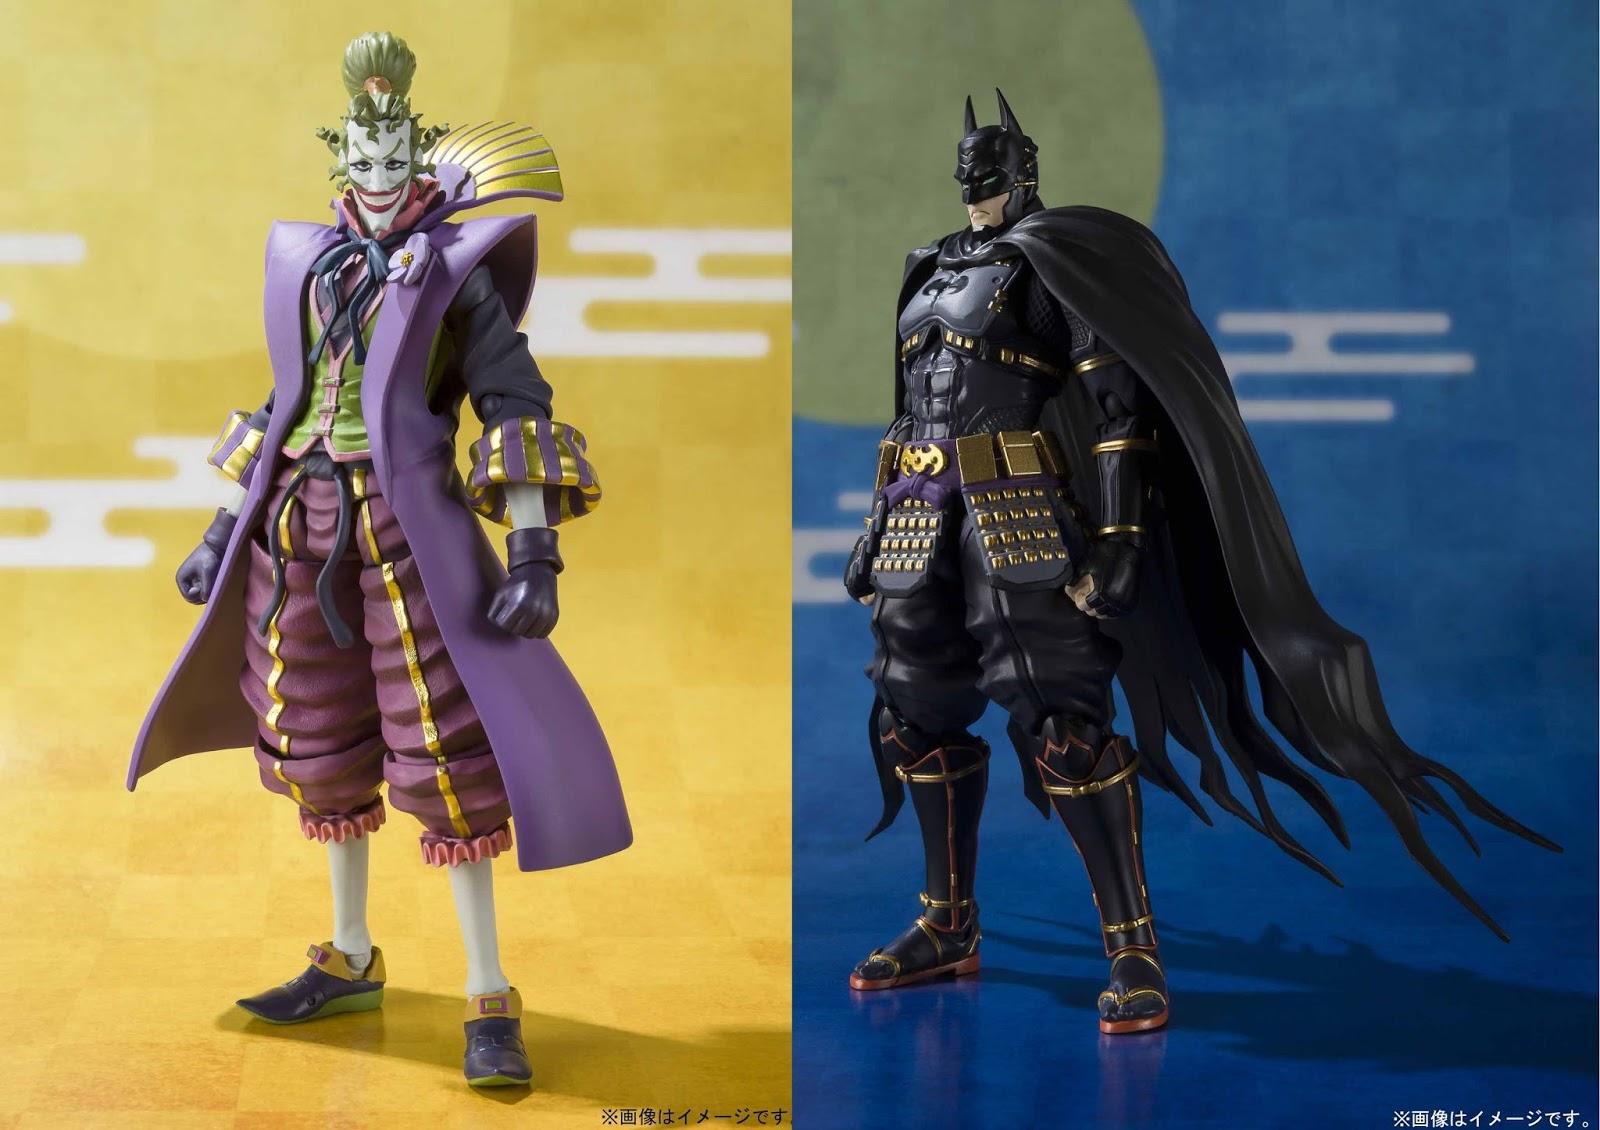 Ninja Batman Joker Demon King S.H SH Figuarts Action Figure BANDAI